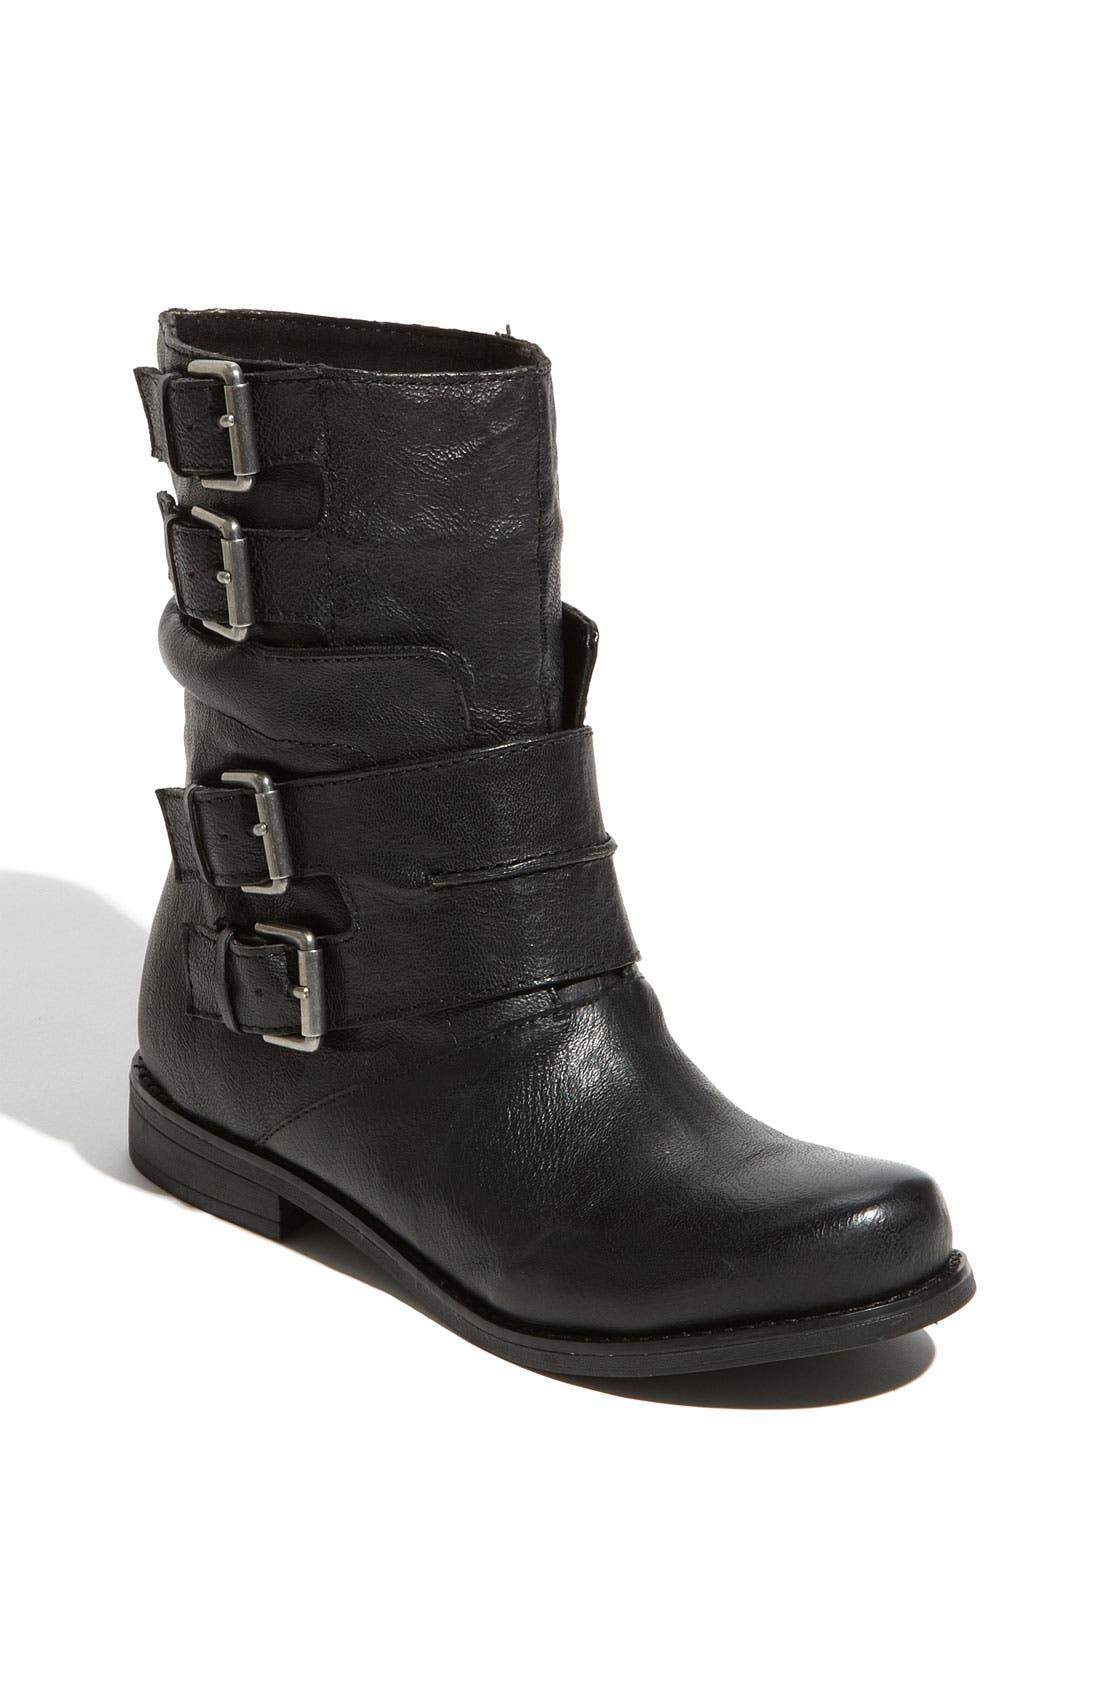 Alternate Image 1 Selected - Nine West 'Fango' Boot